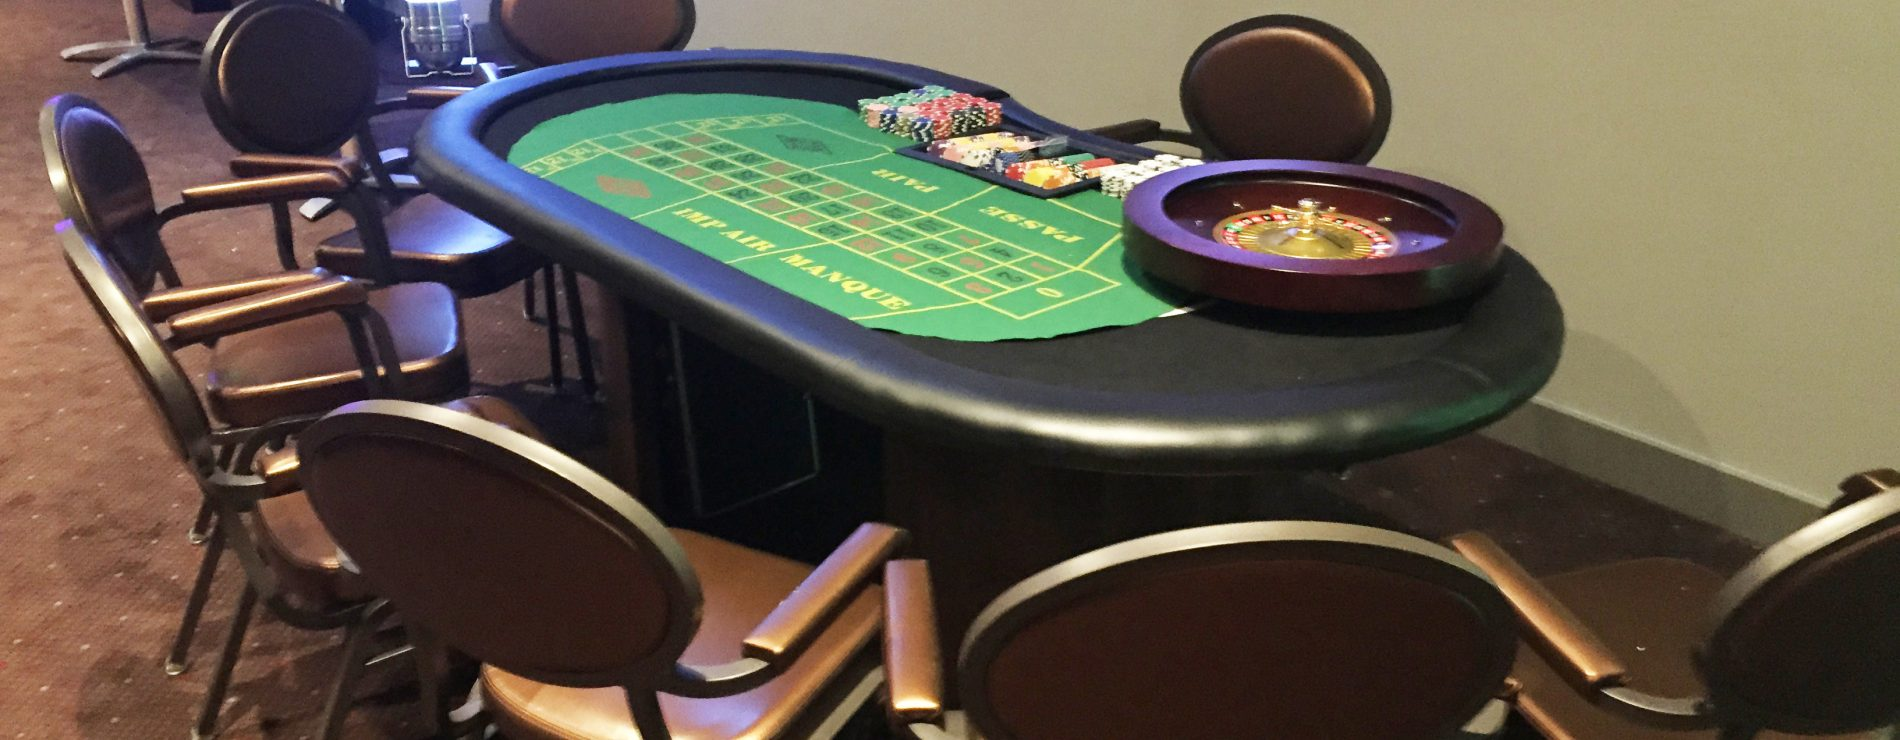 Blackjack 21 online multiplayer